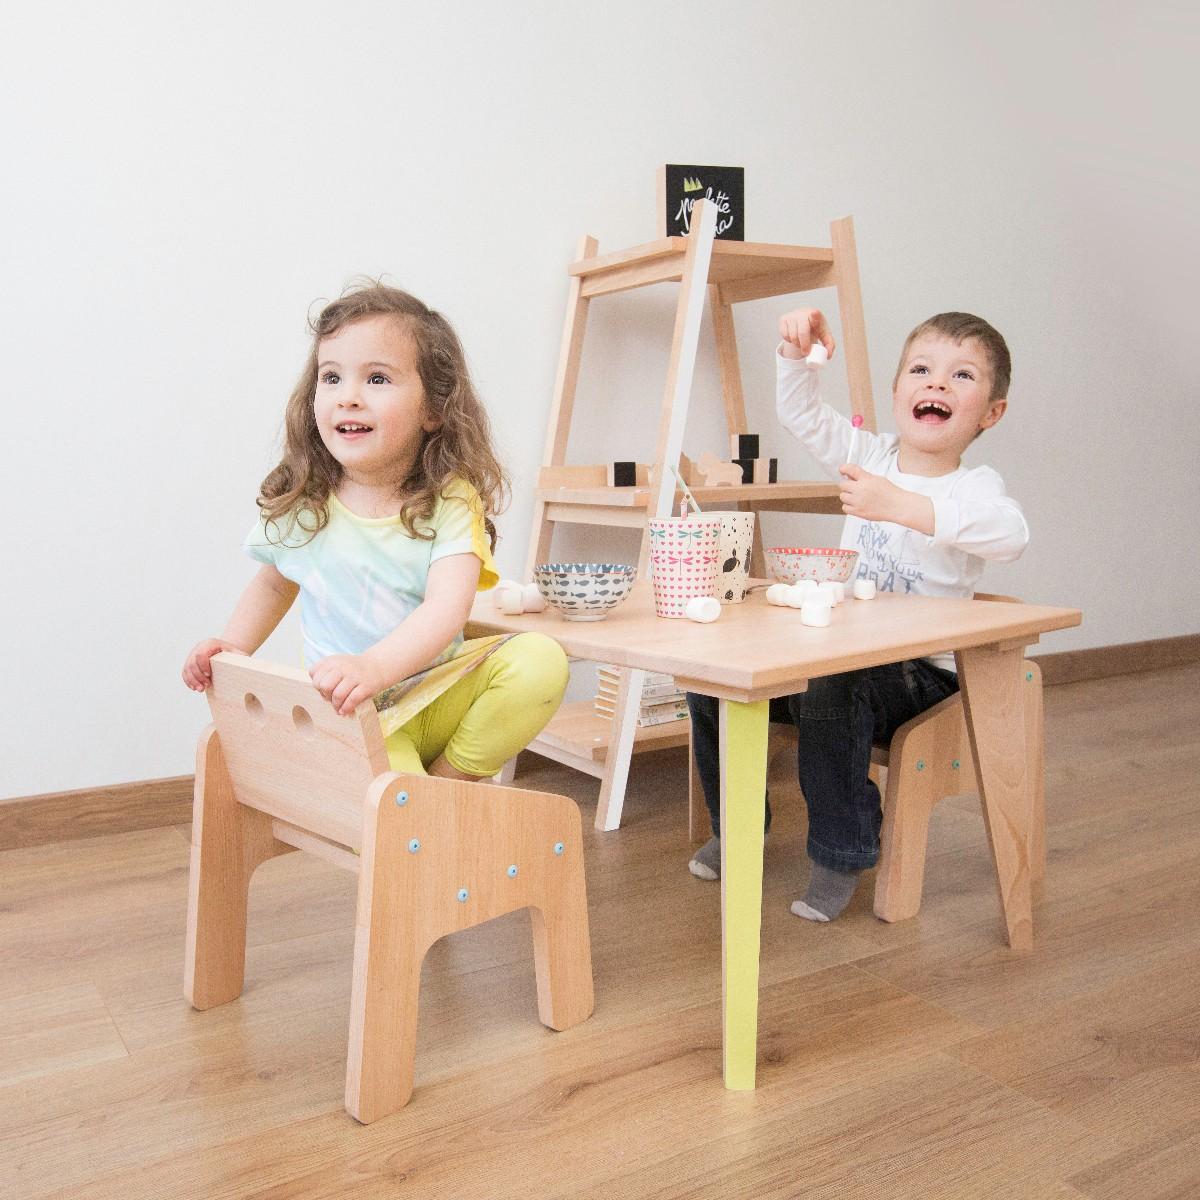 Mobilier design en bois